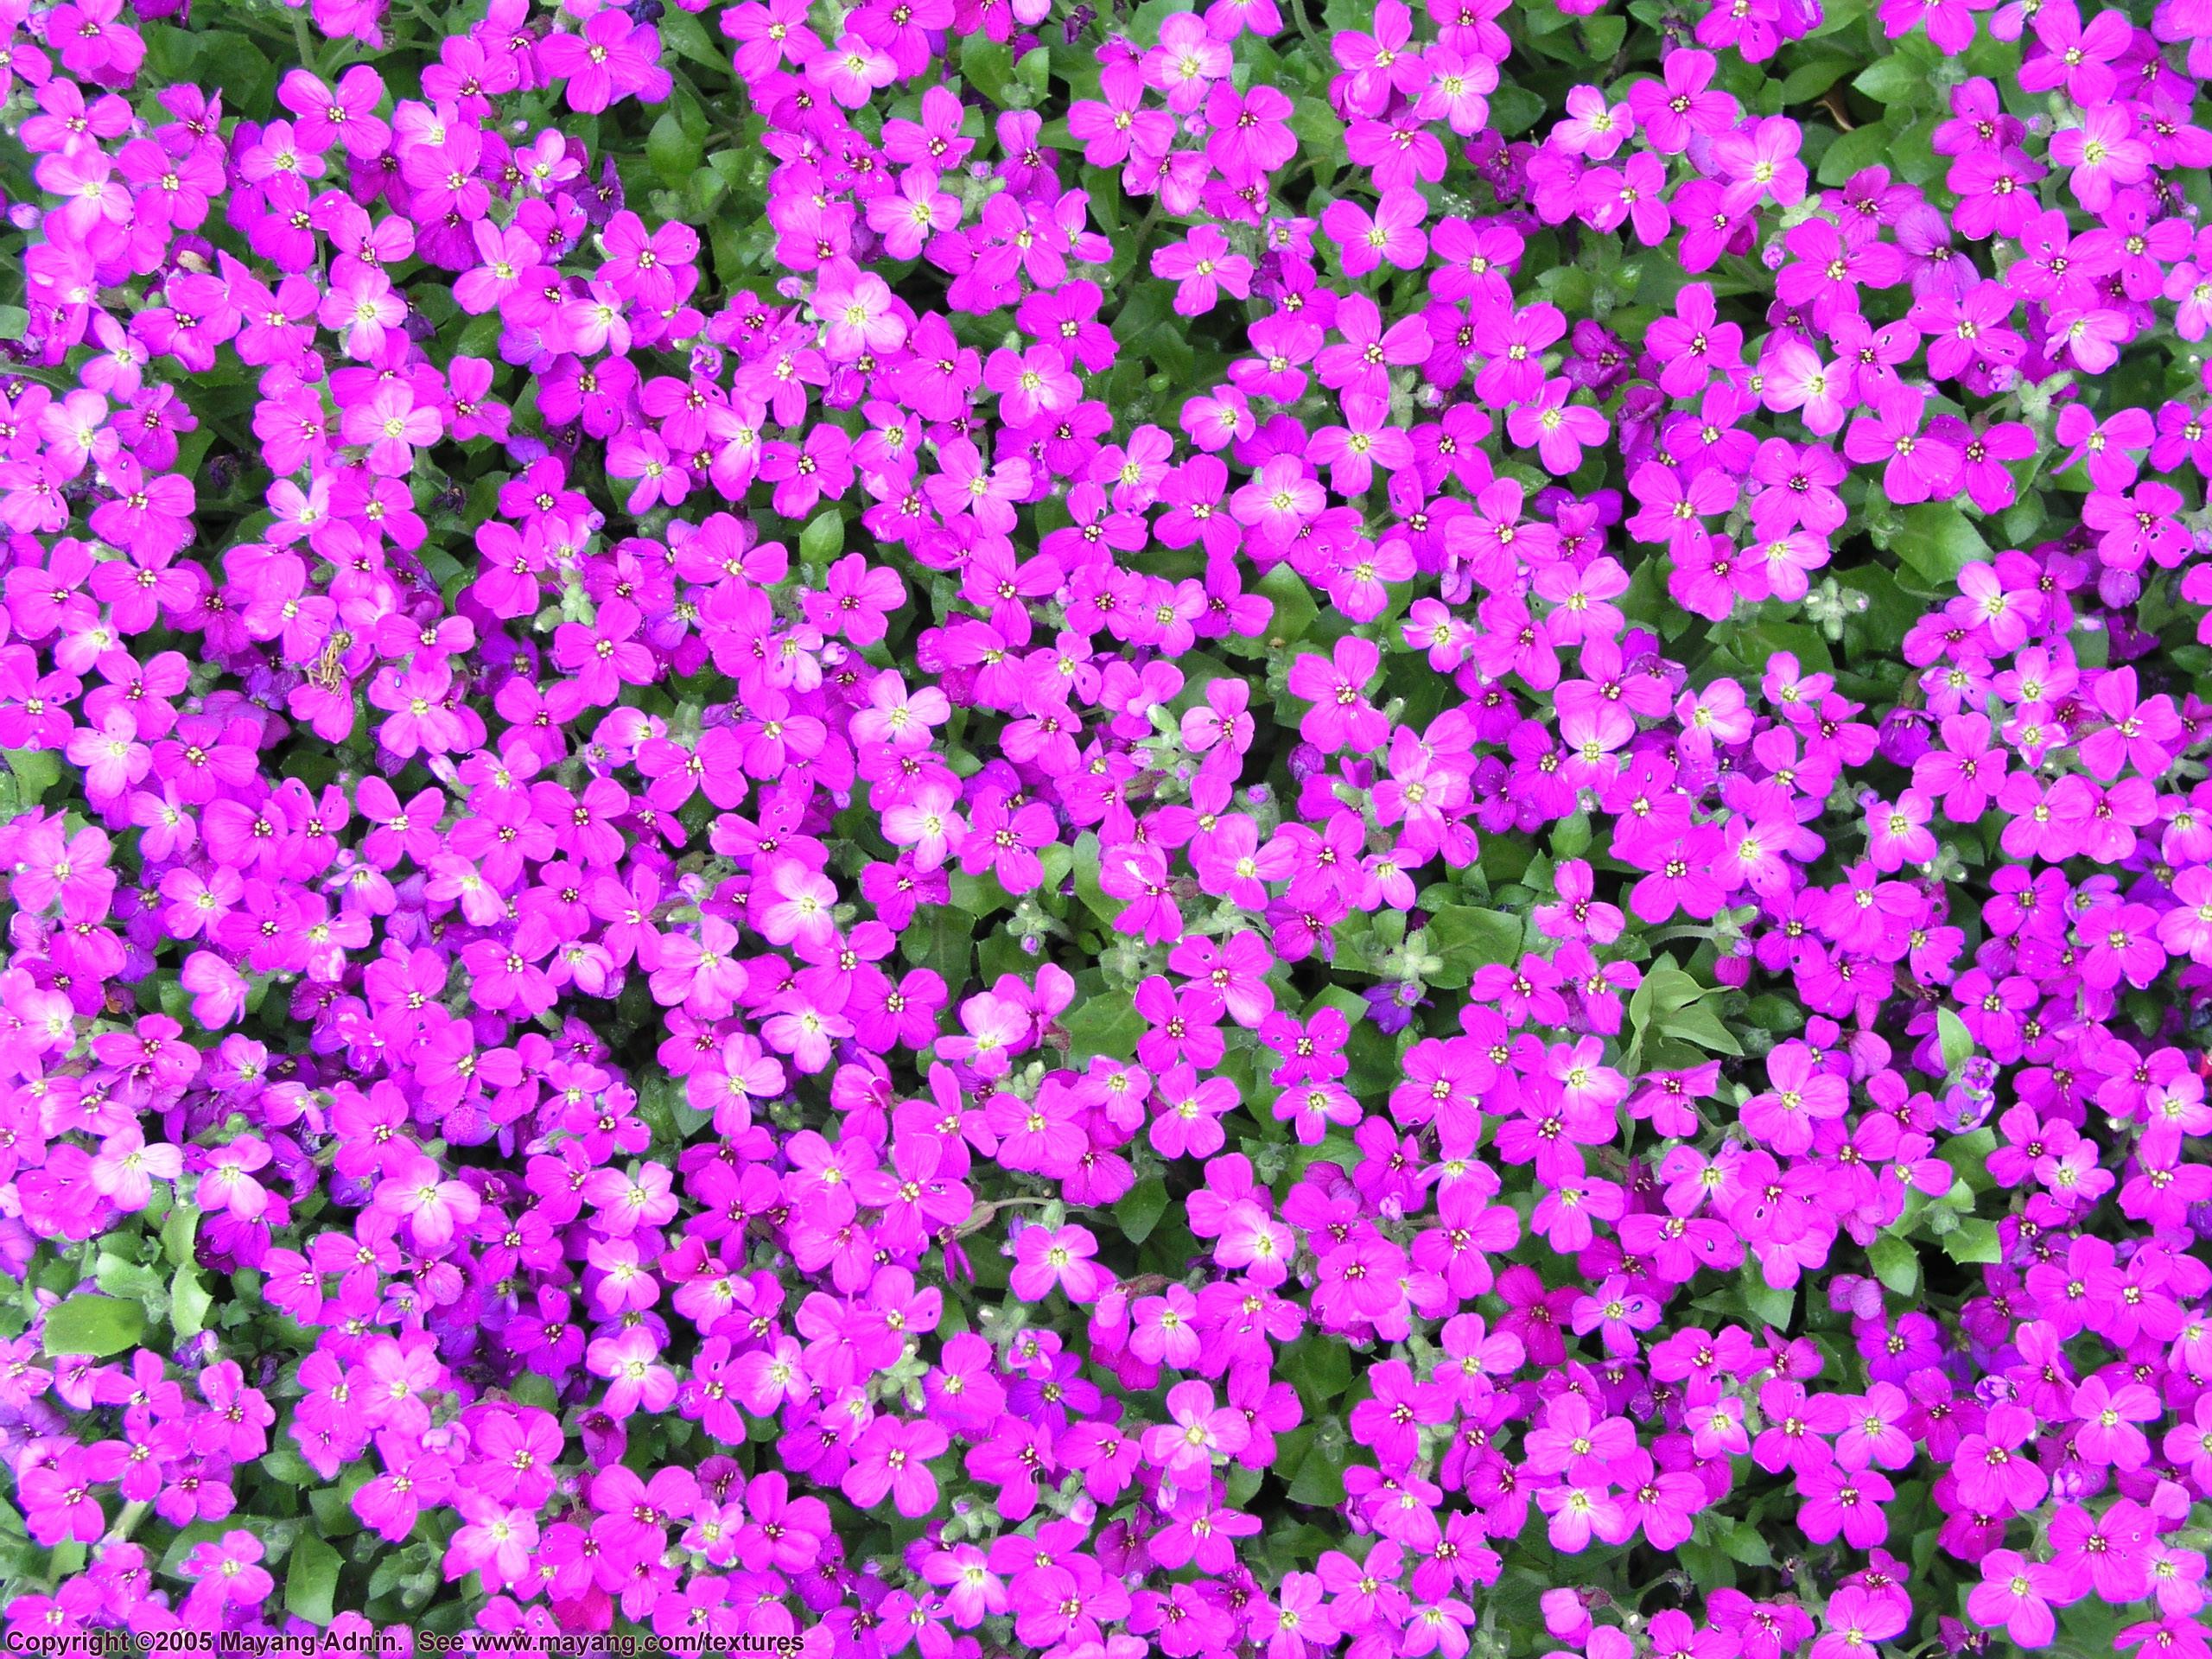 Purple Flower Background 66 Images